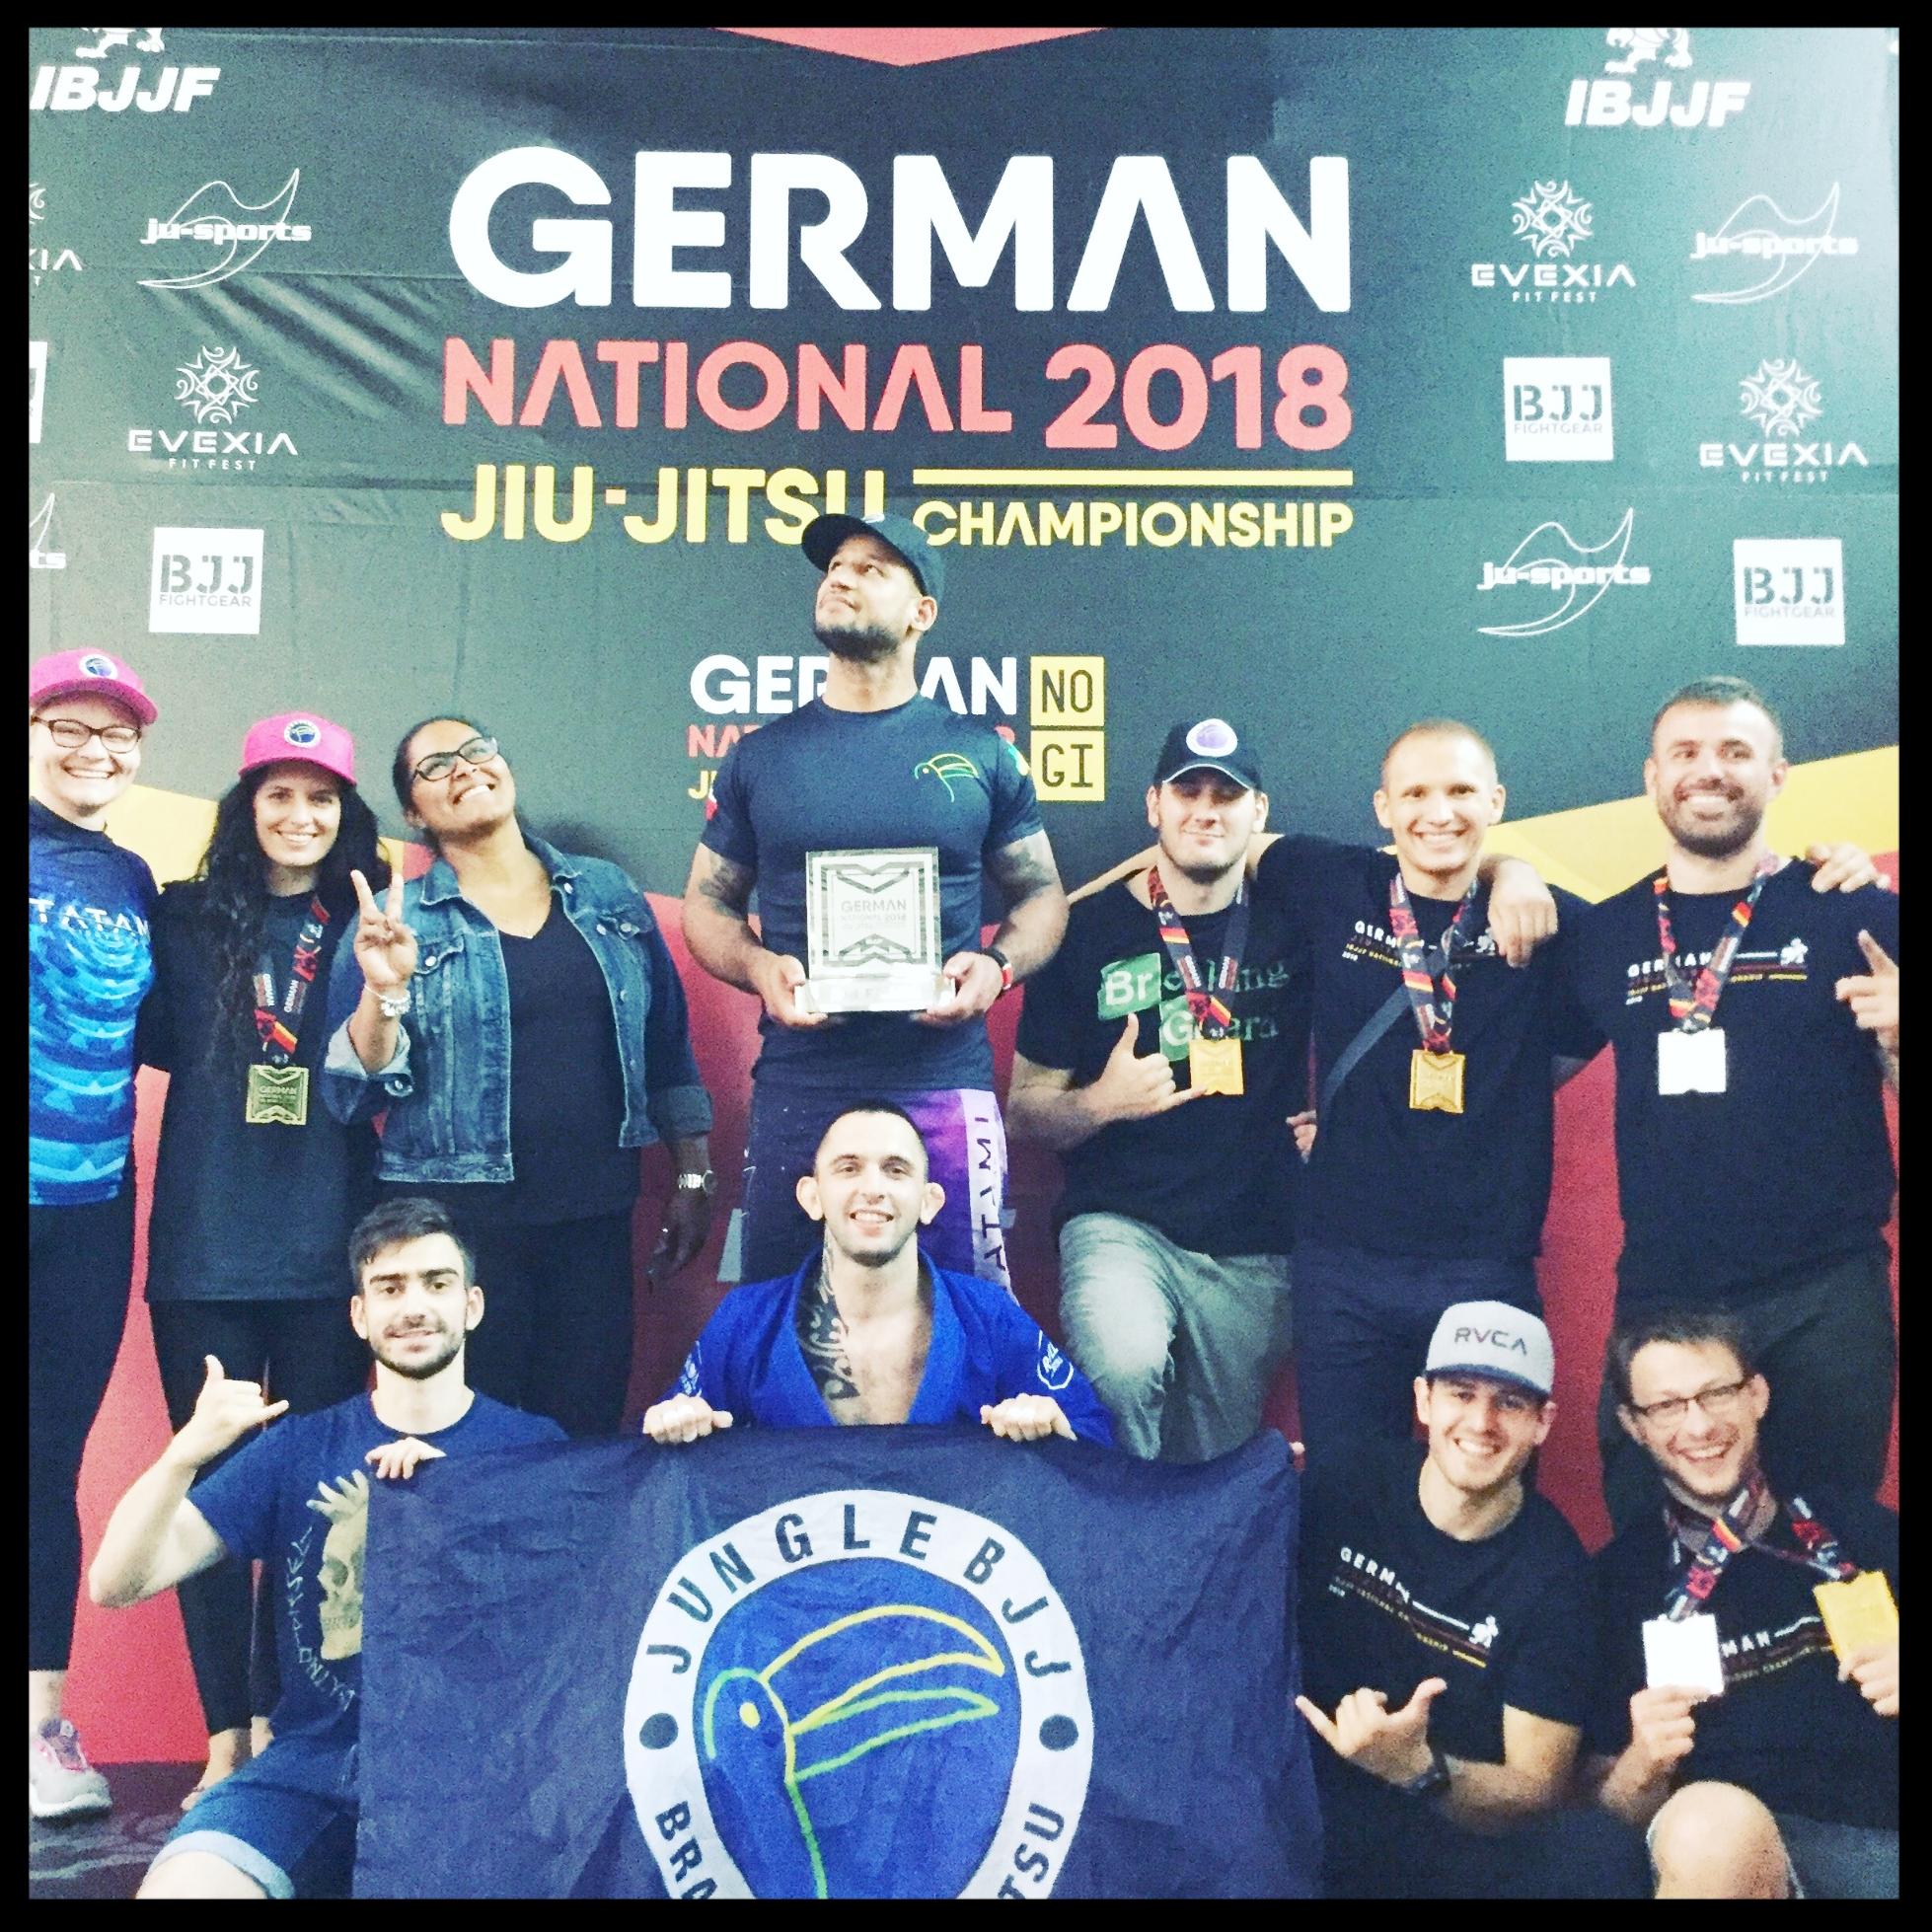 german_2018_podium.jpeg